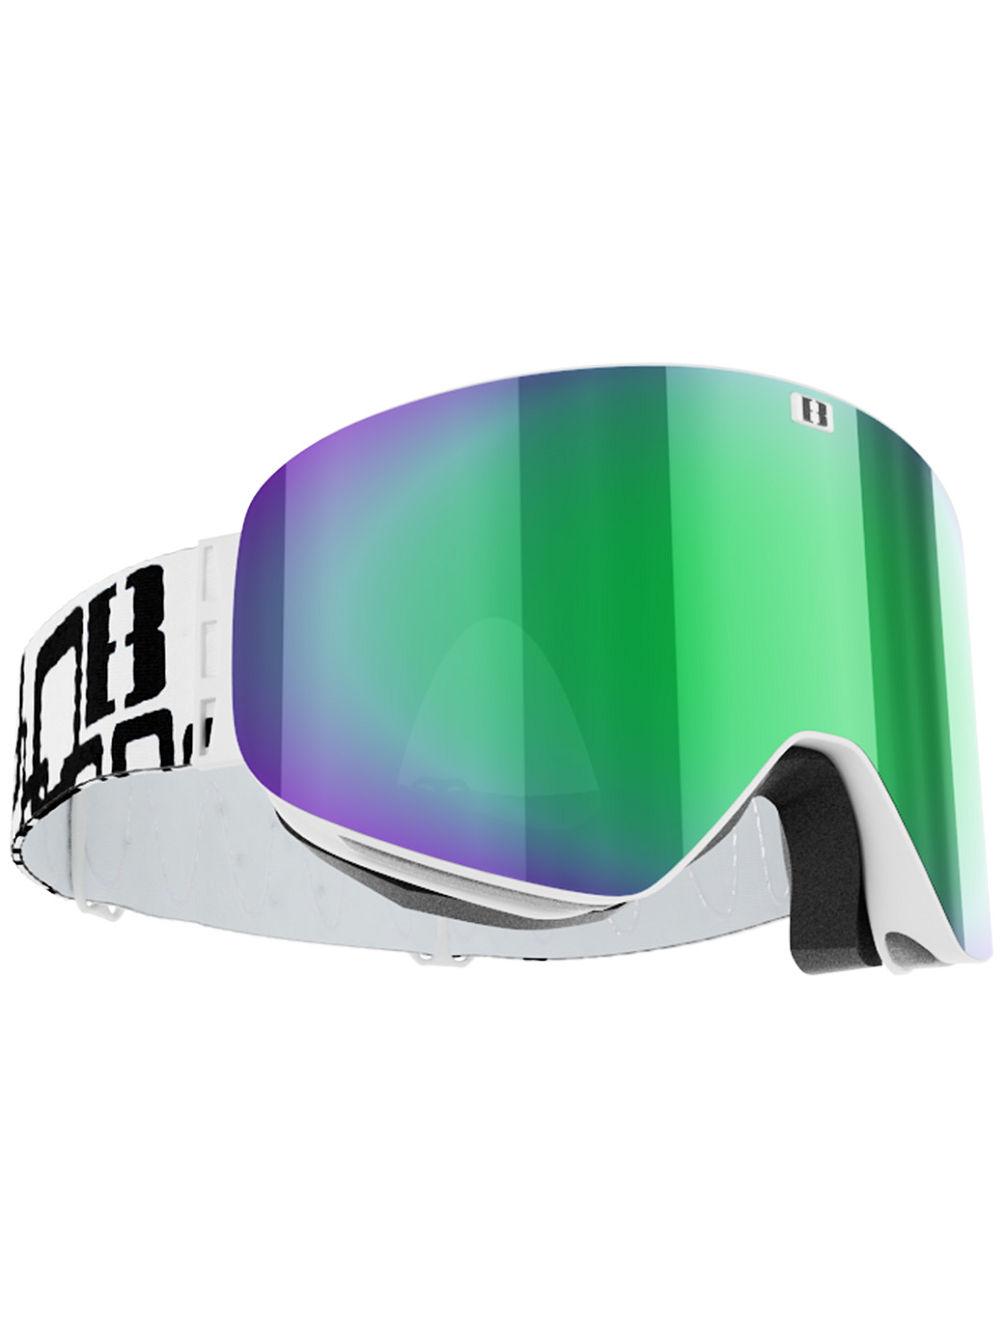 bliz-protective-sports-gear-flow-white